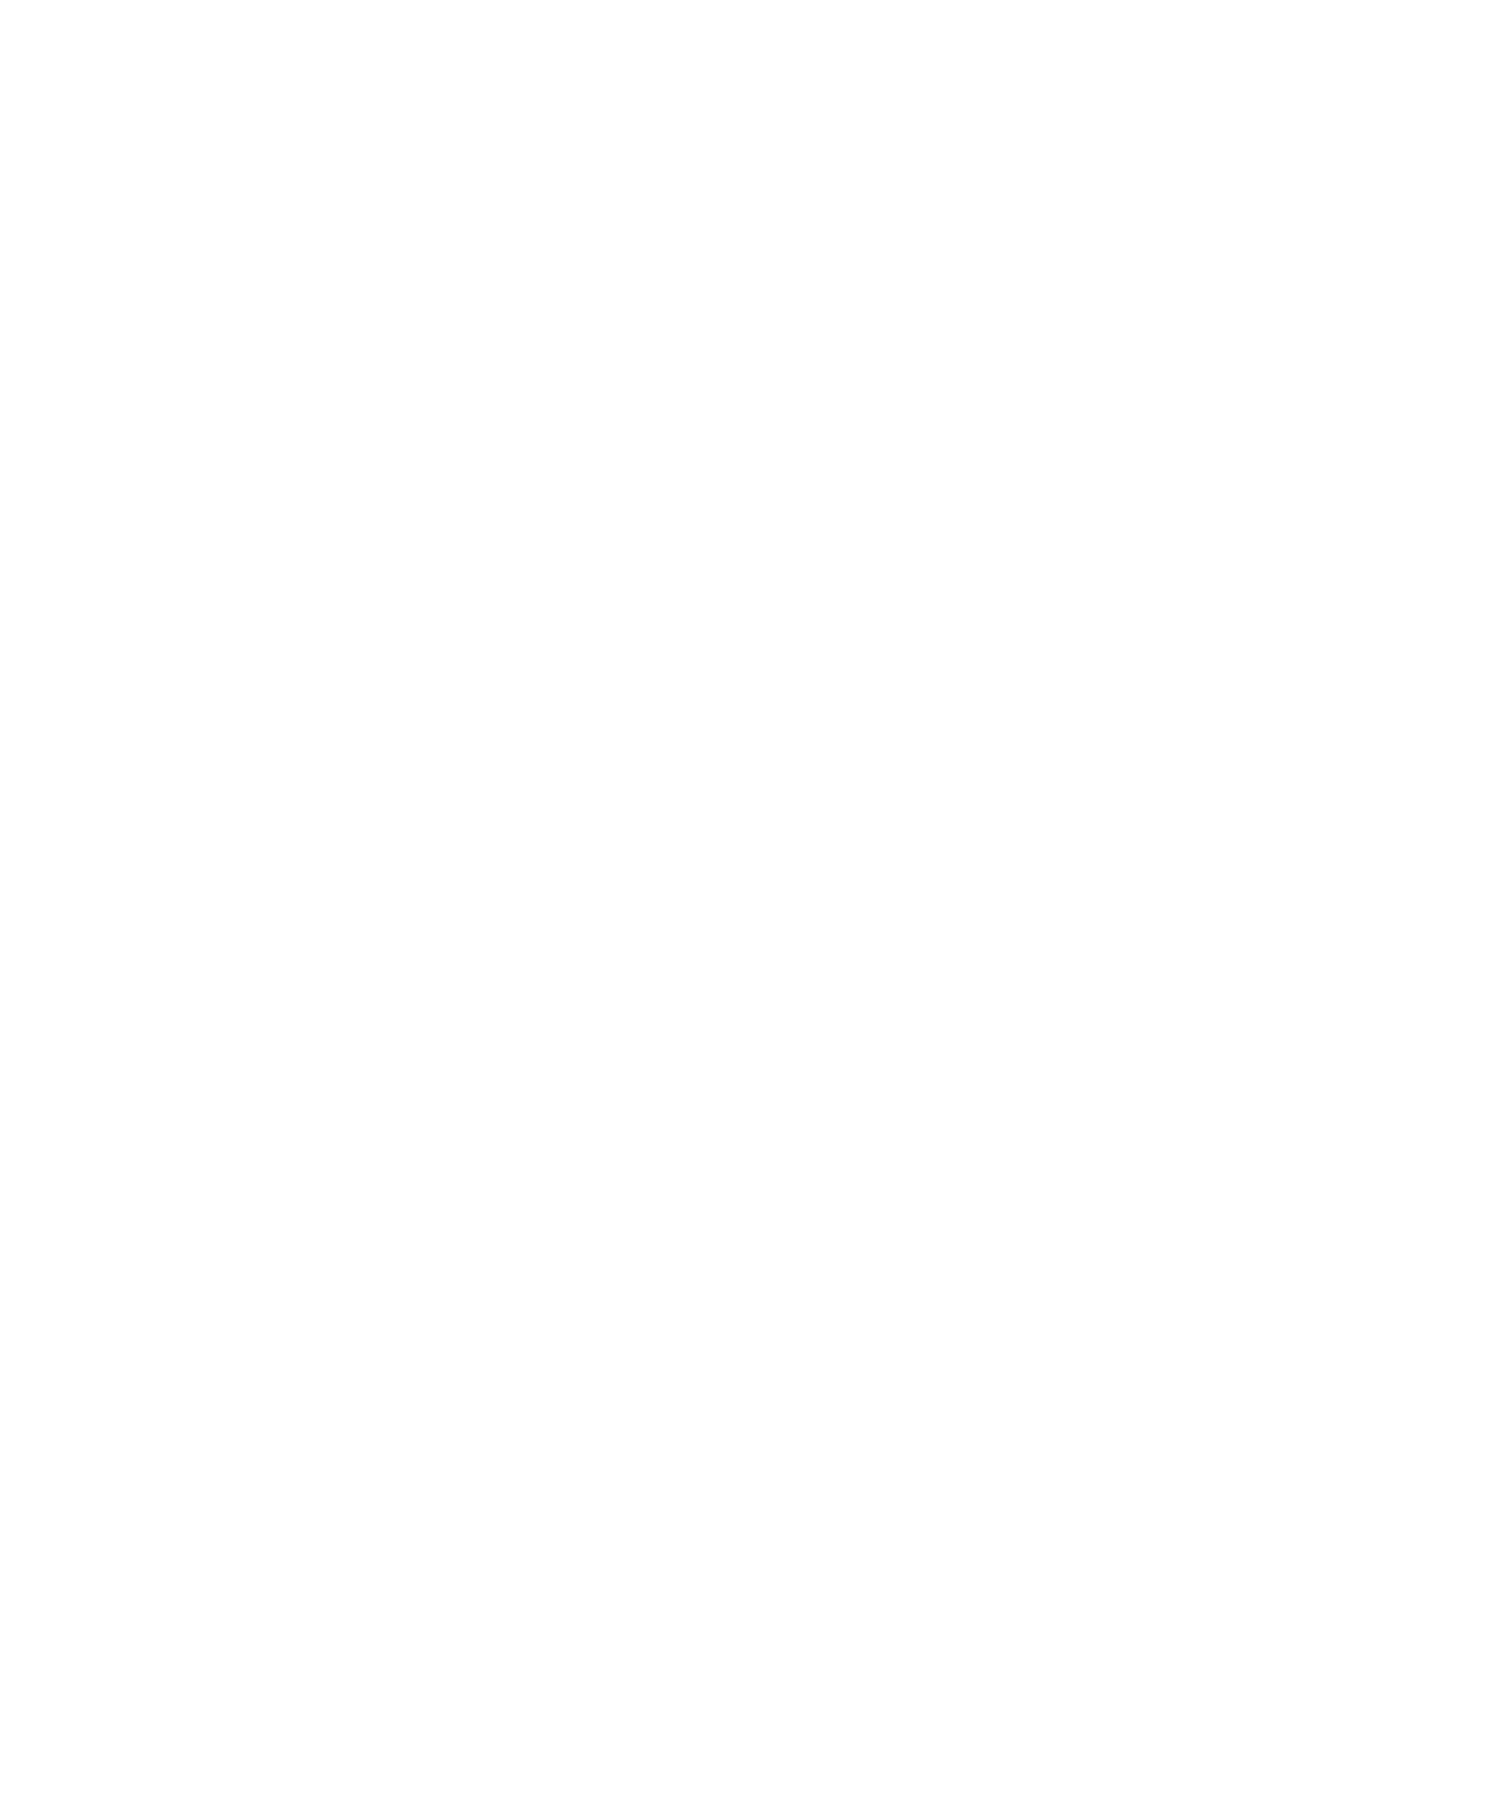 mariposa_0146